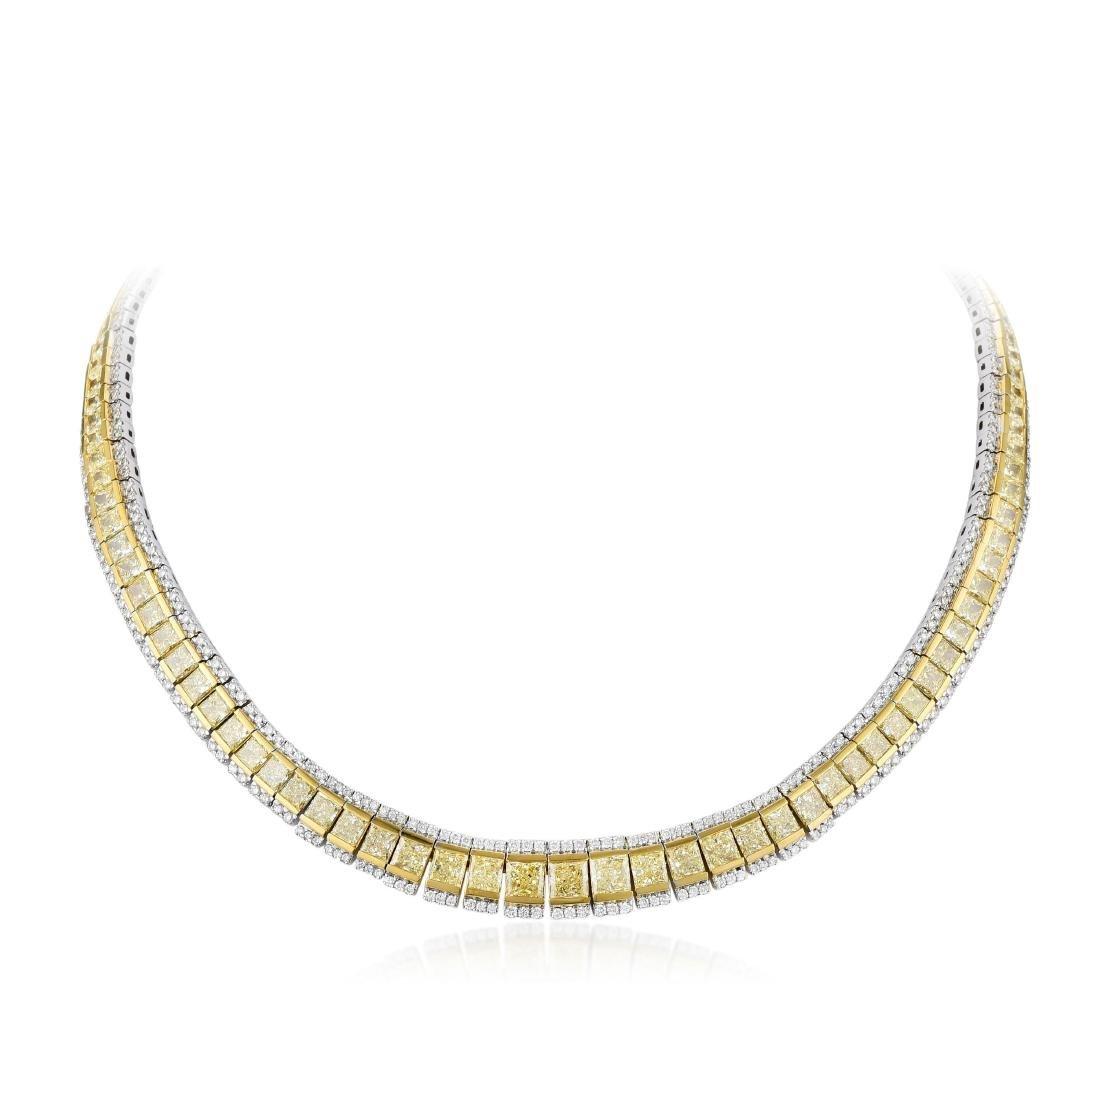 A Yellow Diamond Necklace